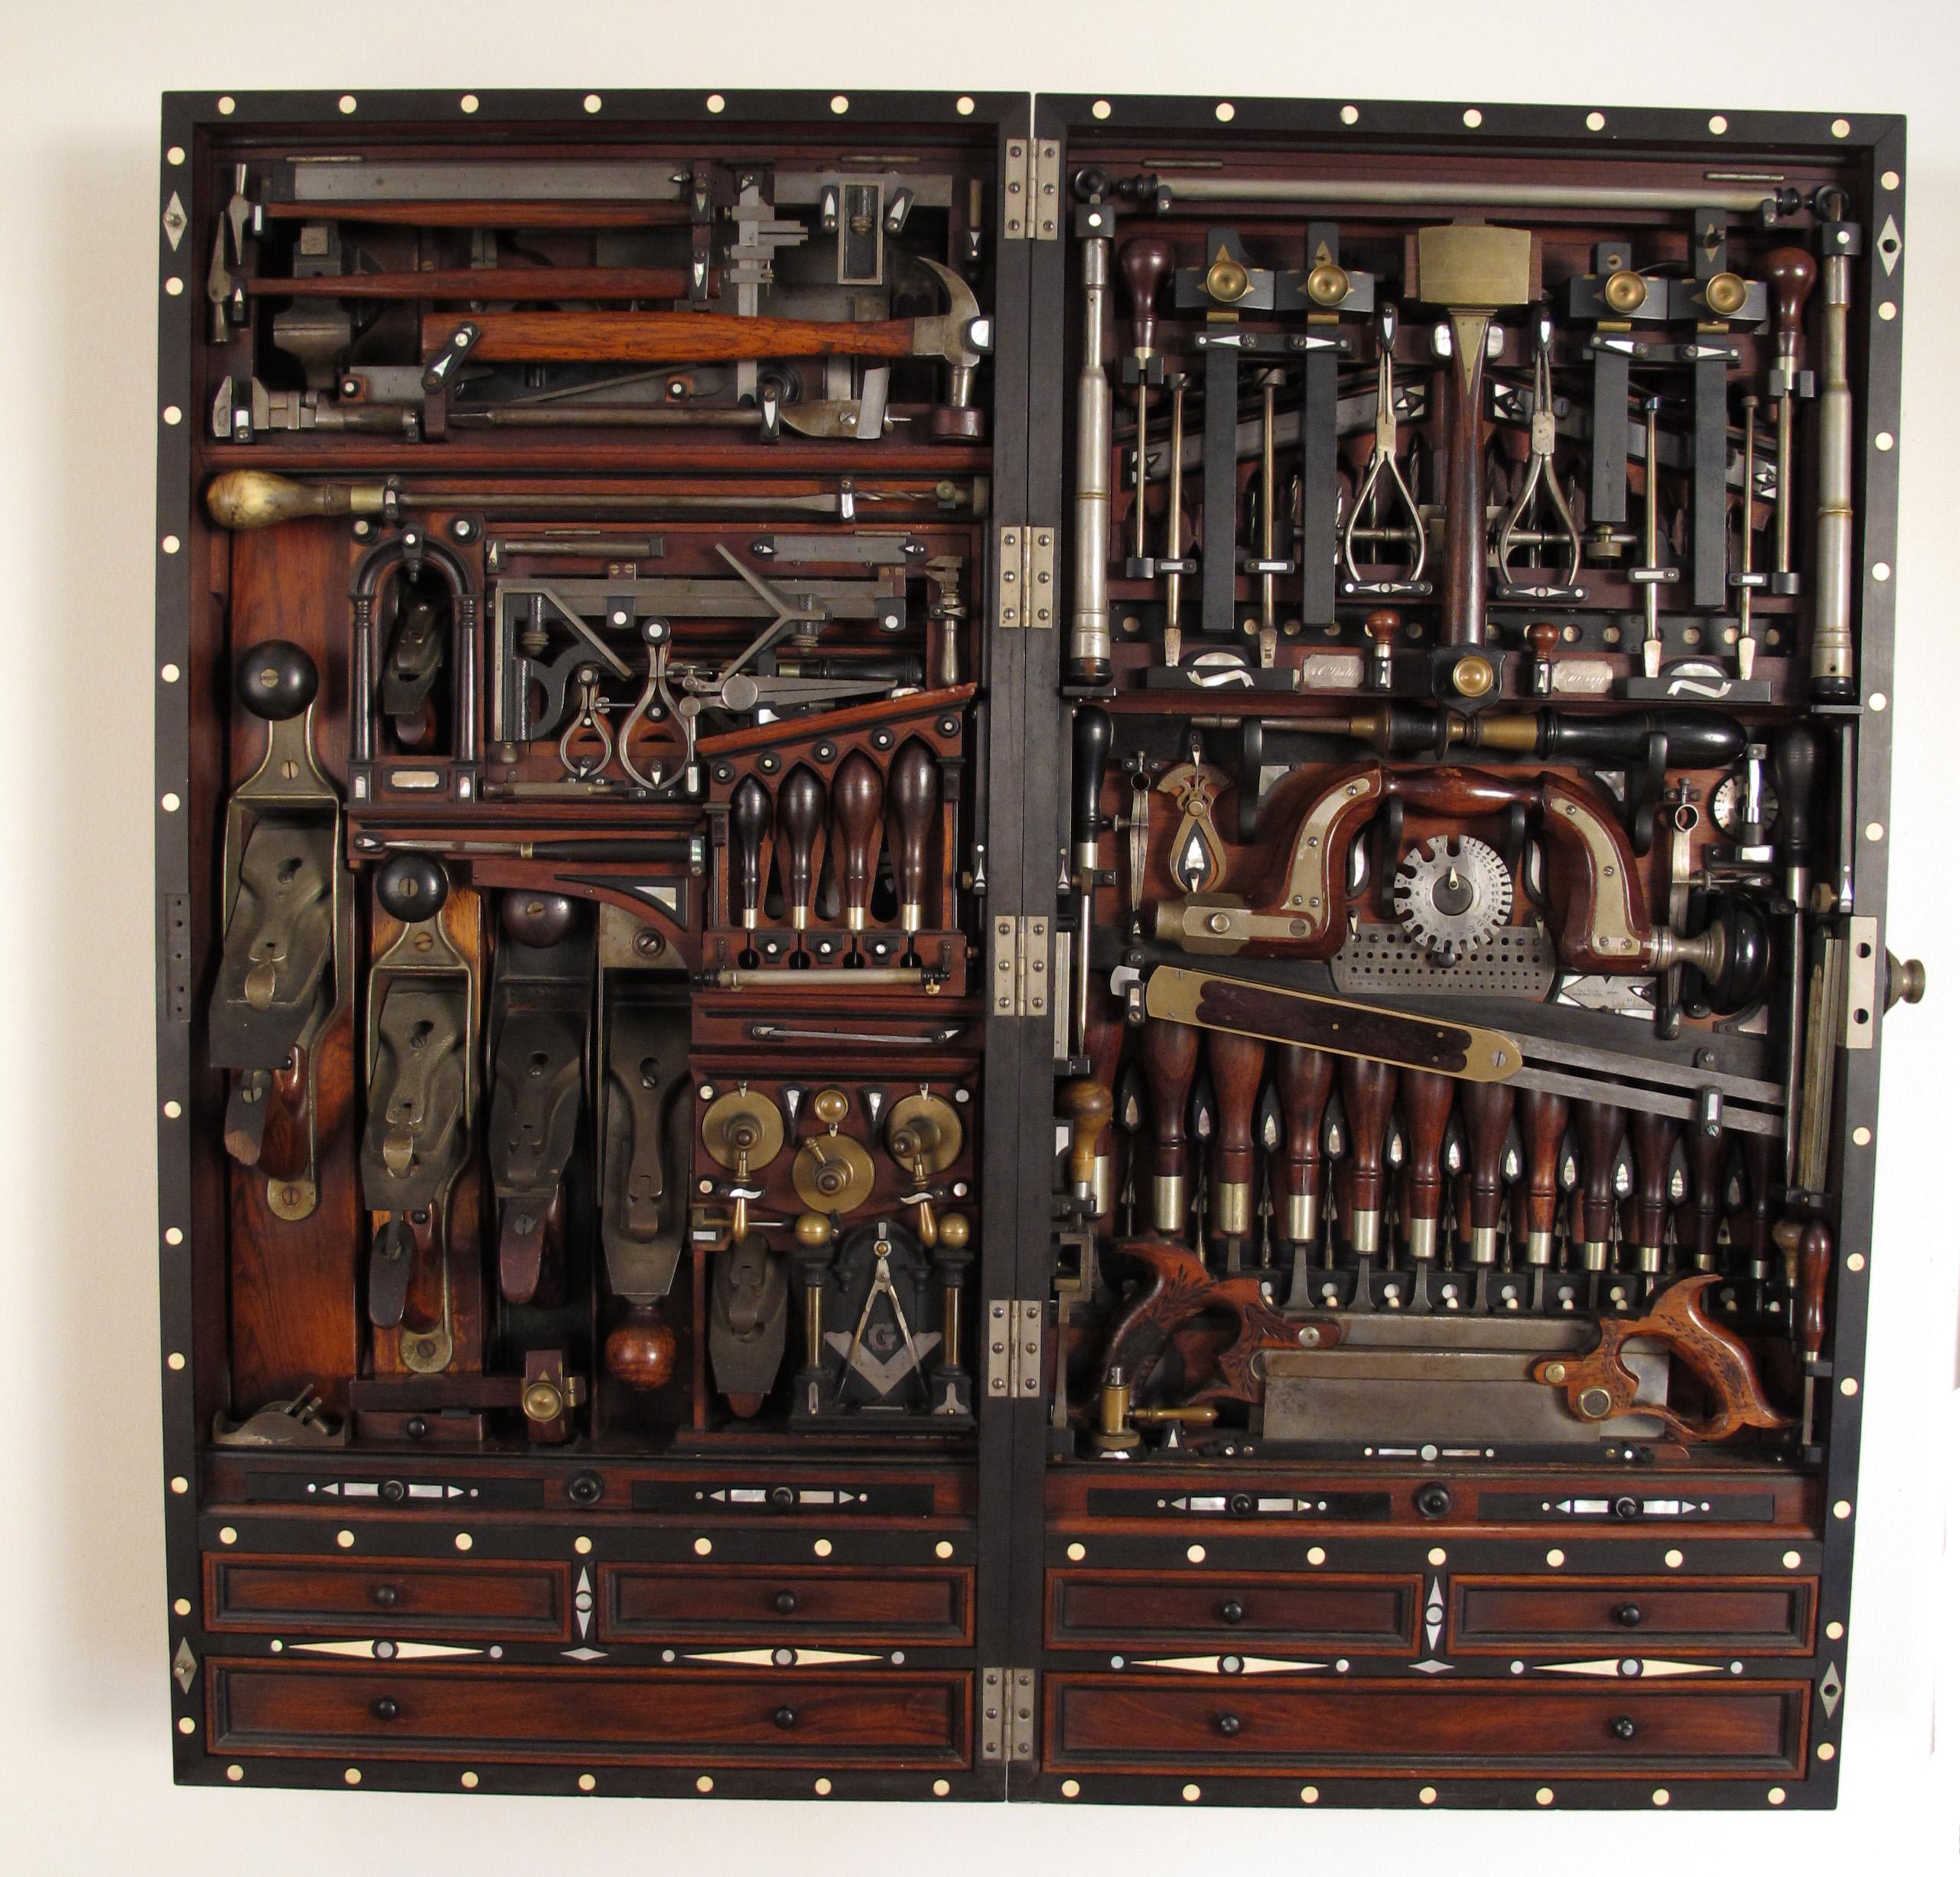 garage storage plans ideas - Studley Tool Chest Exhibit FAQs